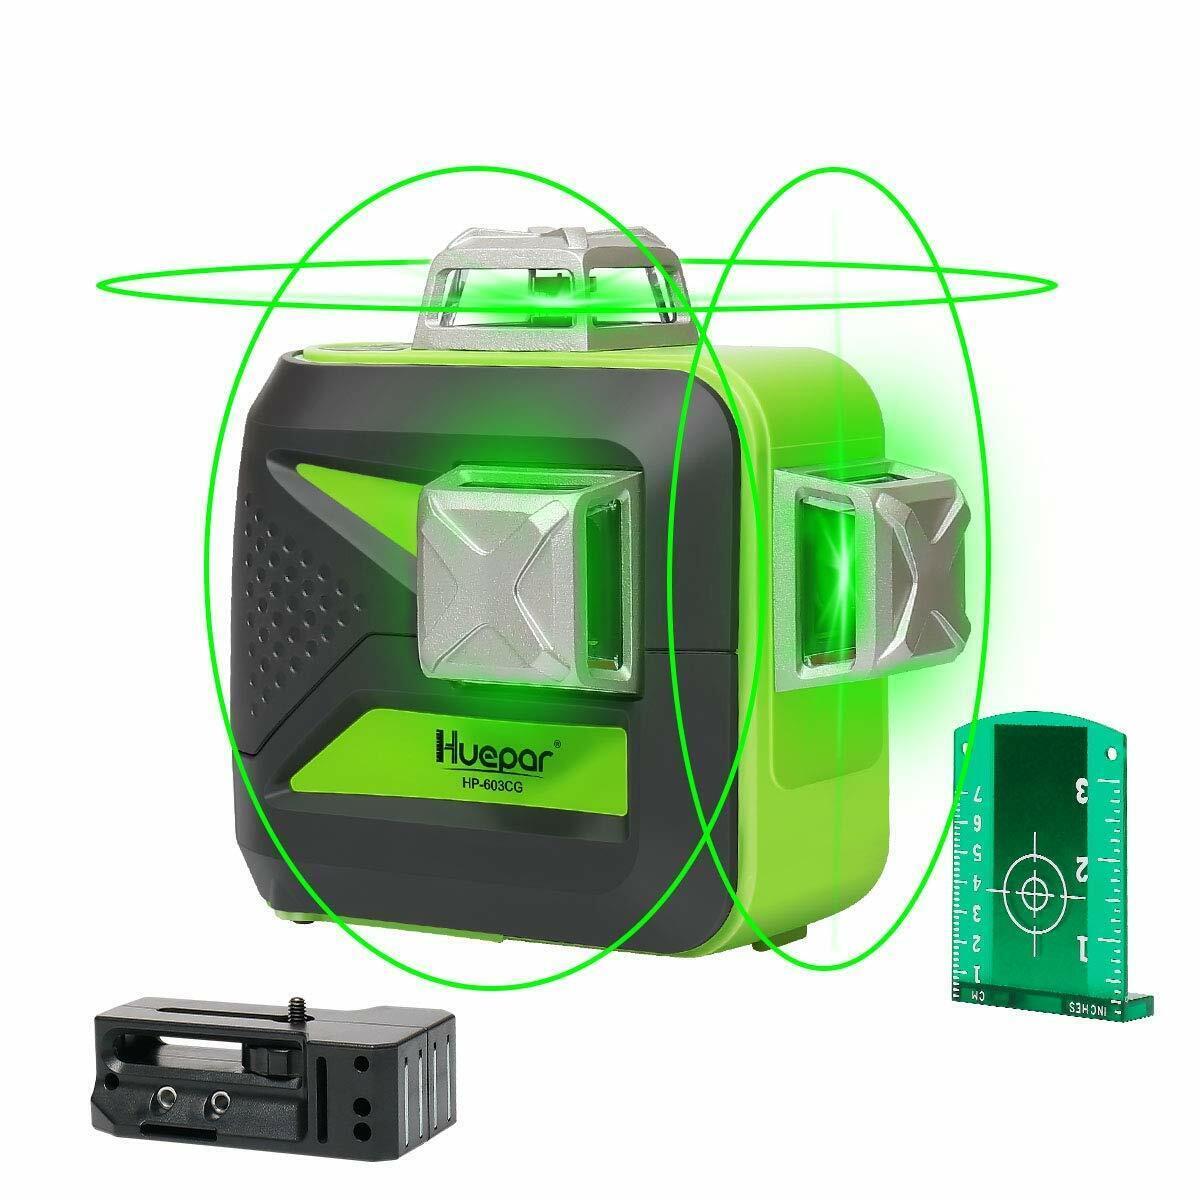 Huepar 12 Line Laser Level 3D 360°Kreuzlinienlaser mit Garantie 603CG